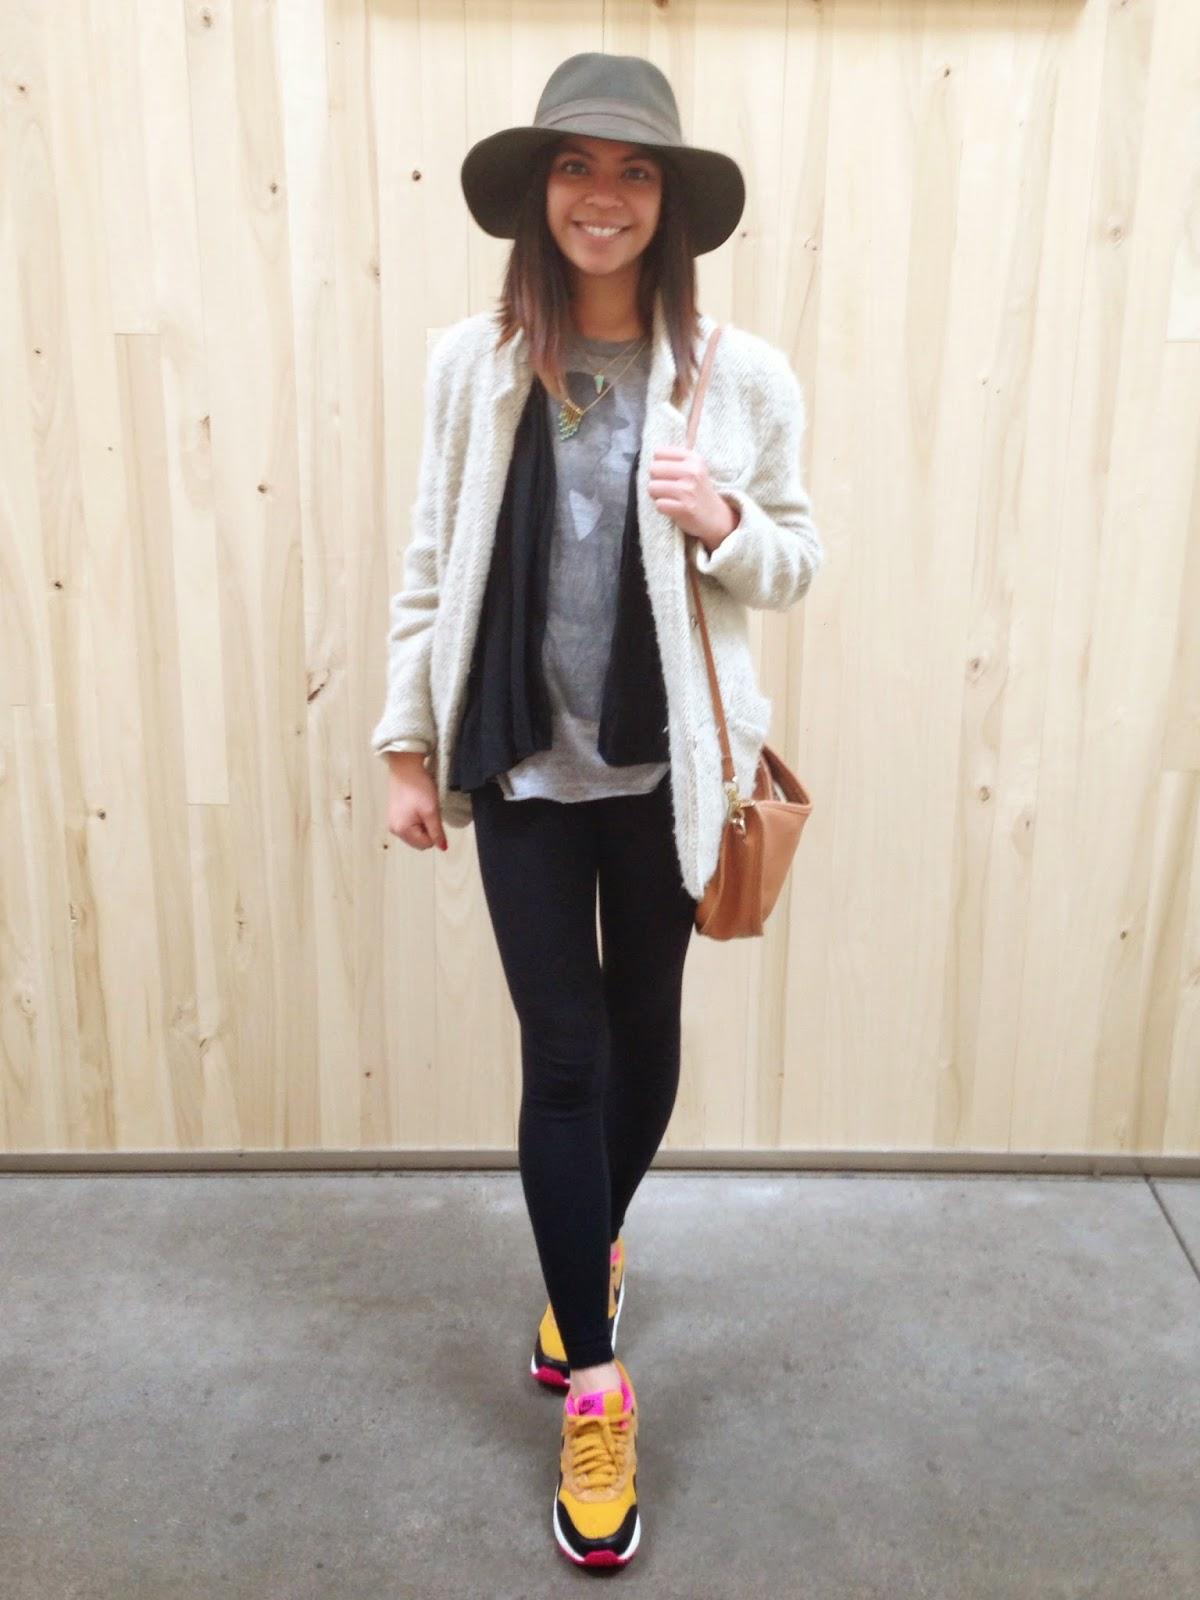 fashion blogger, portland blogger, theptowngirls, ootd, fashion, portland, spring